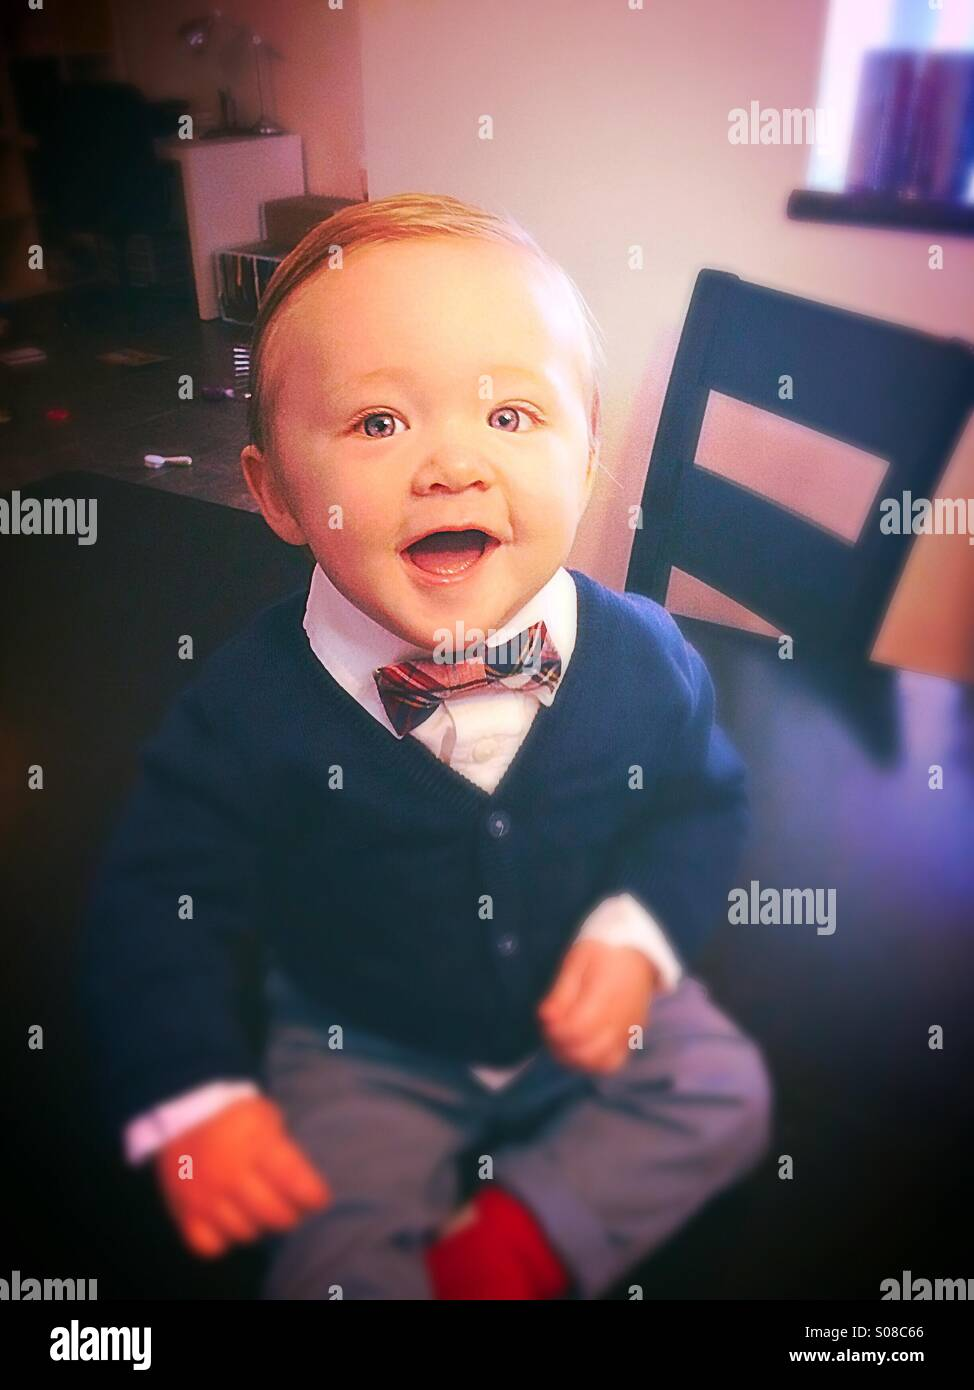 Dapper baby. - Stock Image